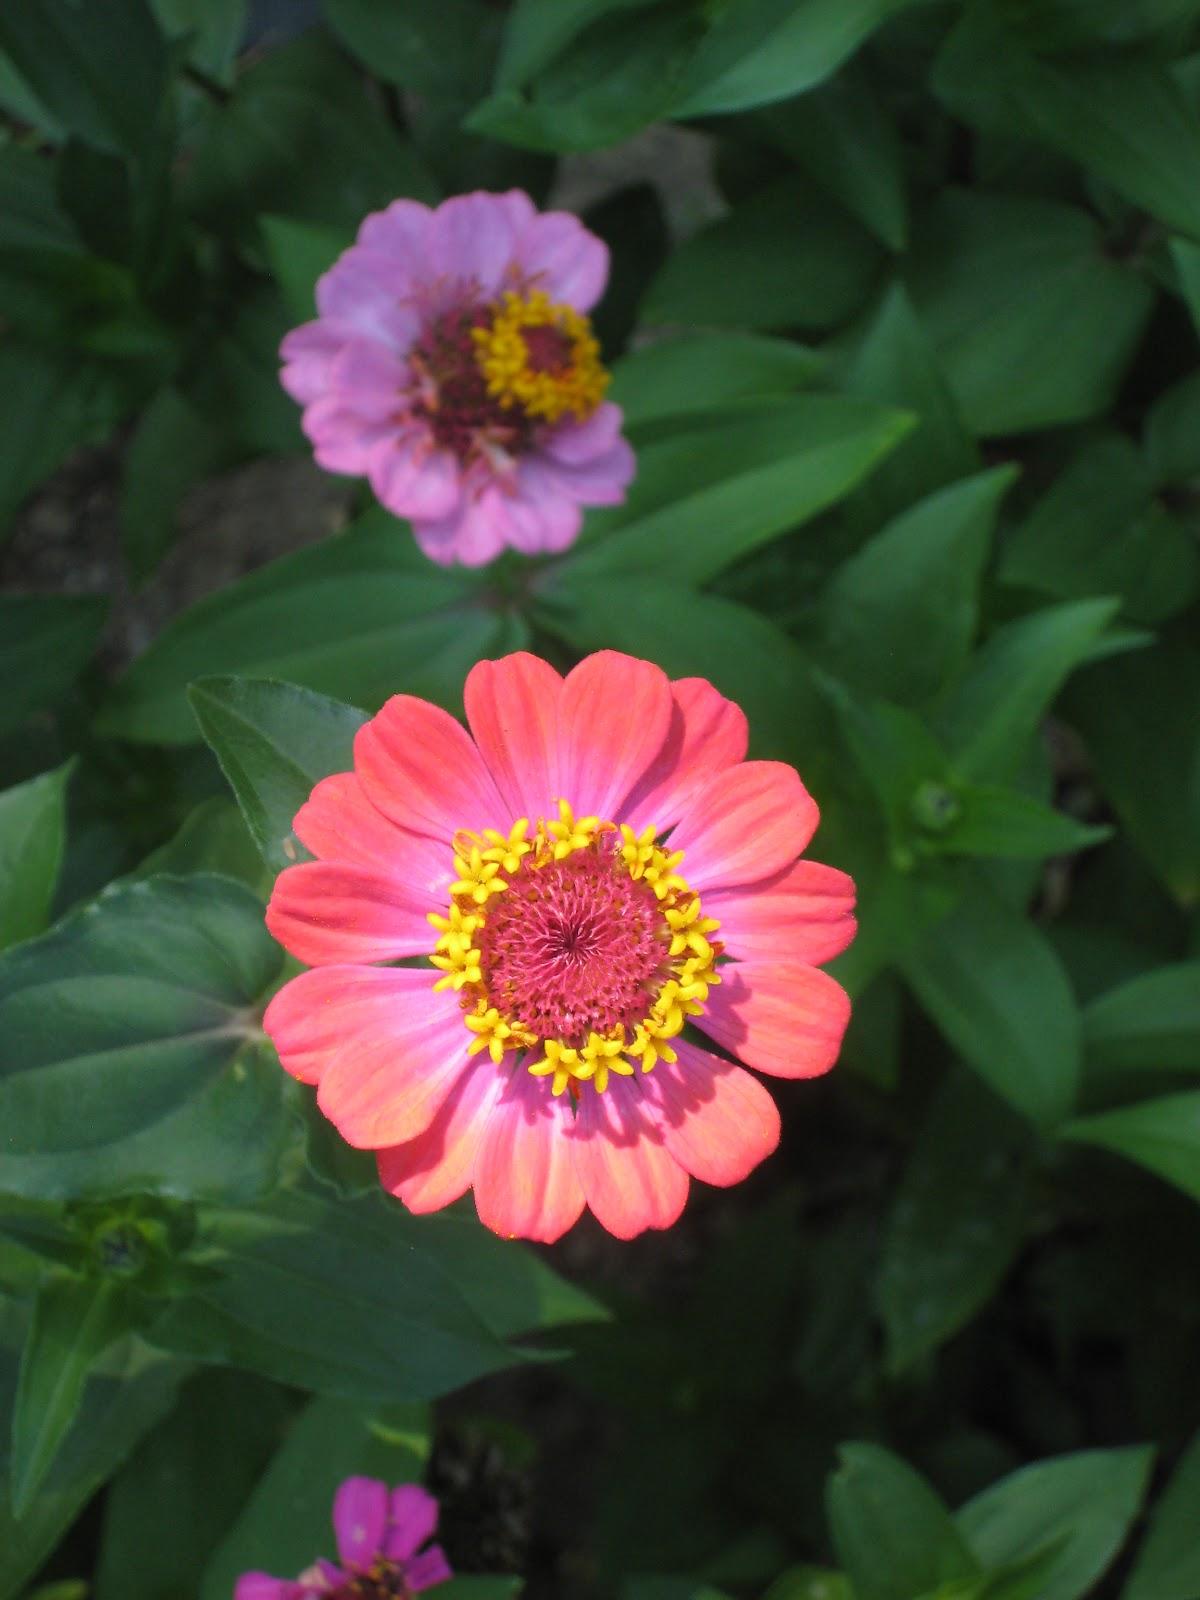 Classic elite yarns jones farm and greenhouse hot house summer jones farm and greenhouse hot house summer flowers perennials mightylinksfo